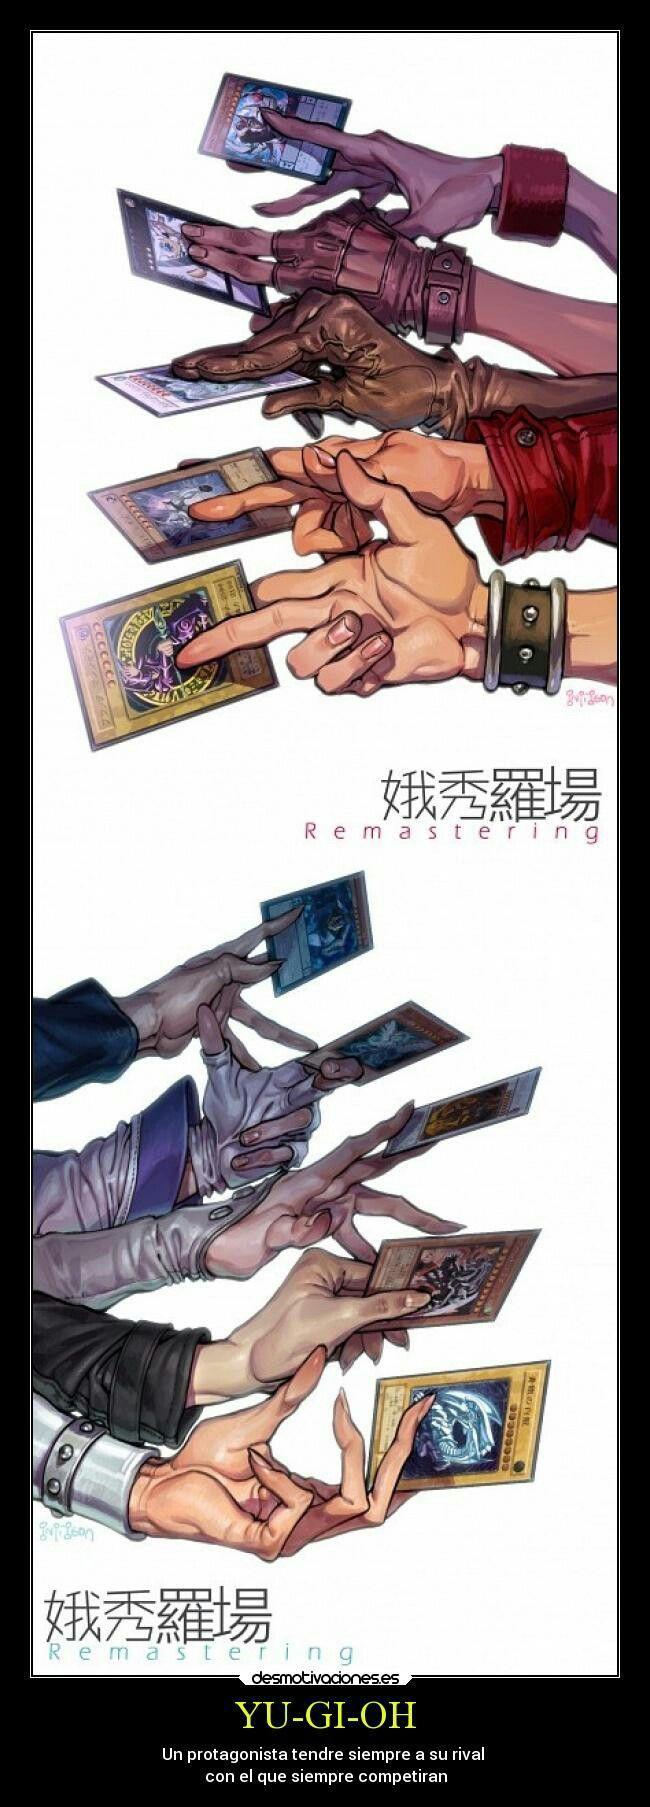 Yu gi ho: un protagonista siempre tendra un rival con rñ que conpetira siempre